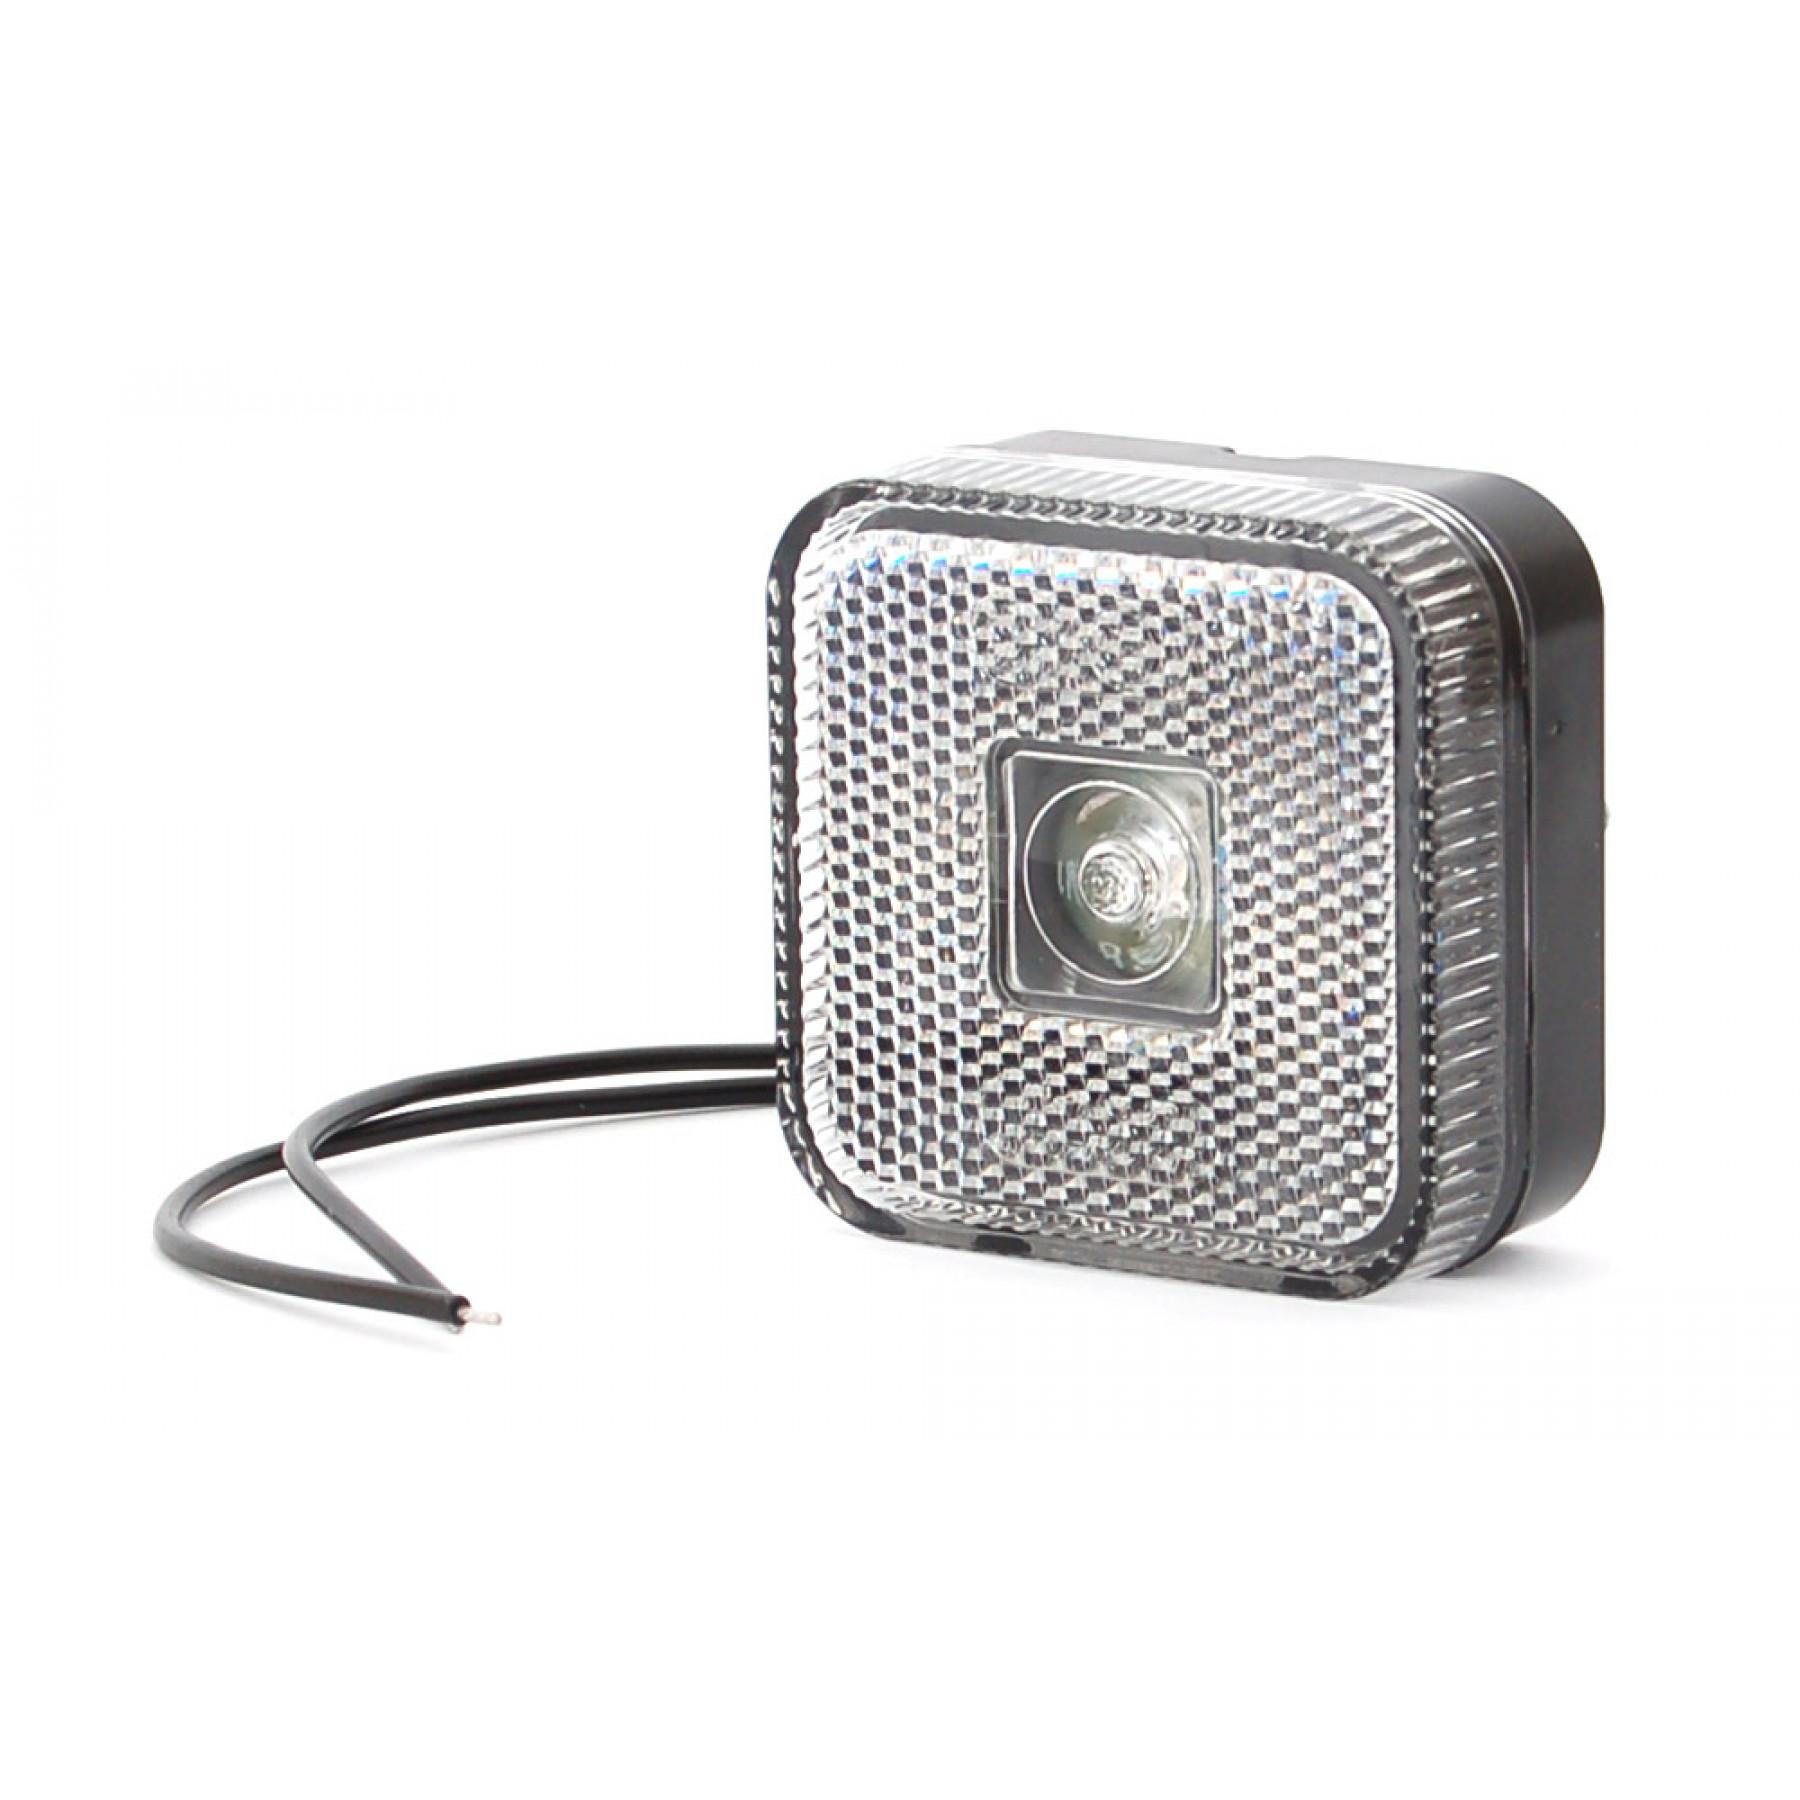 Markeringslamp LED wit 12/24v 65x65x28